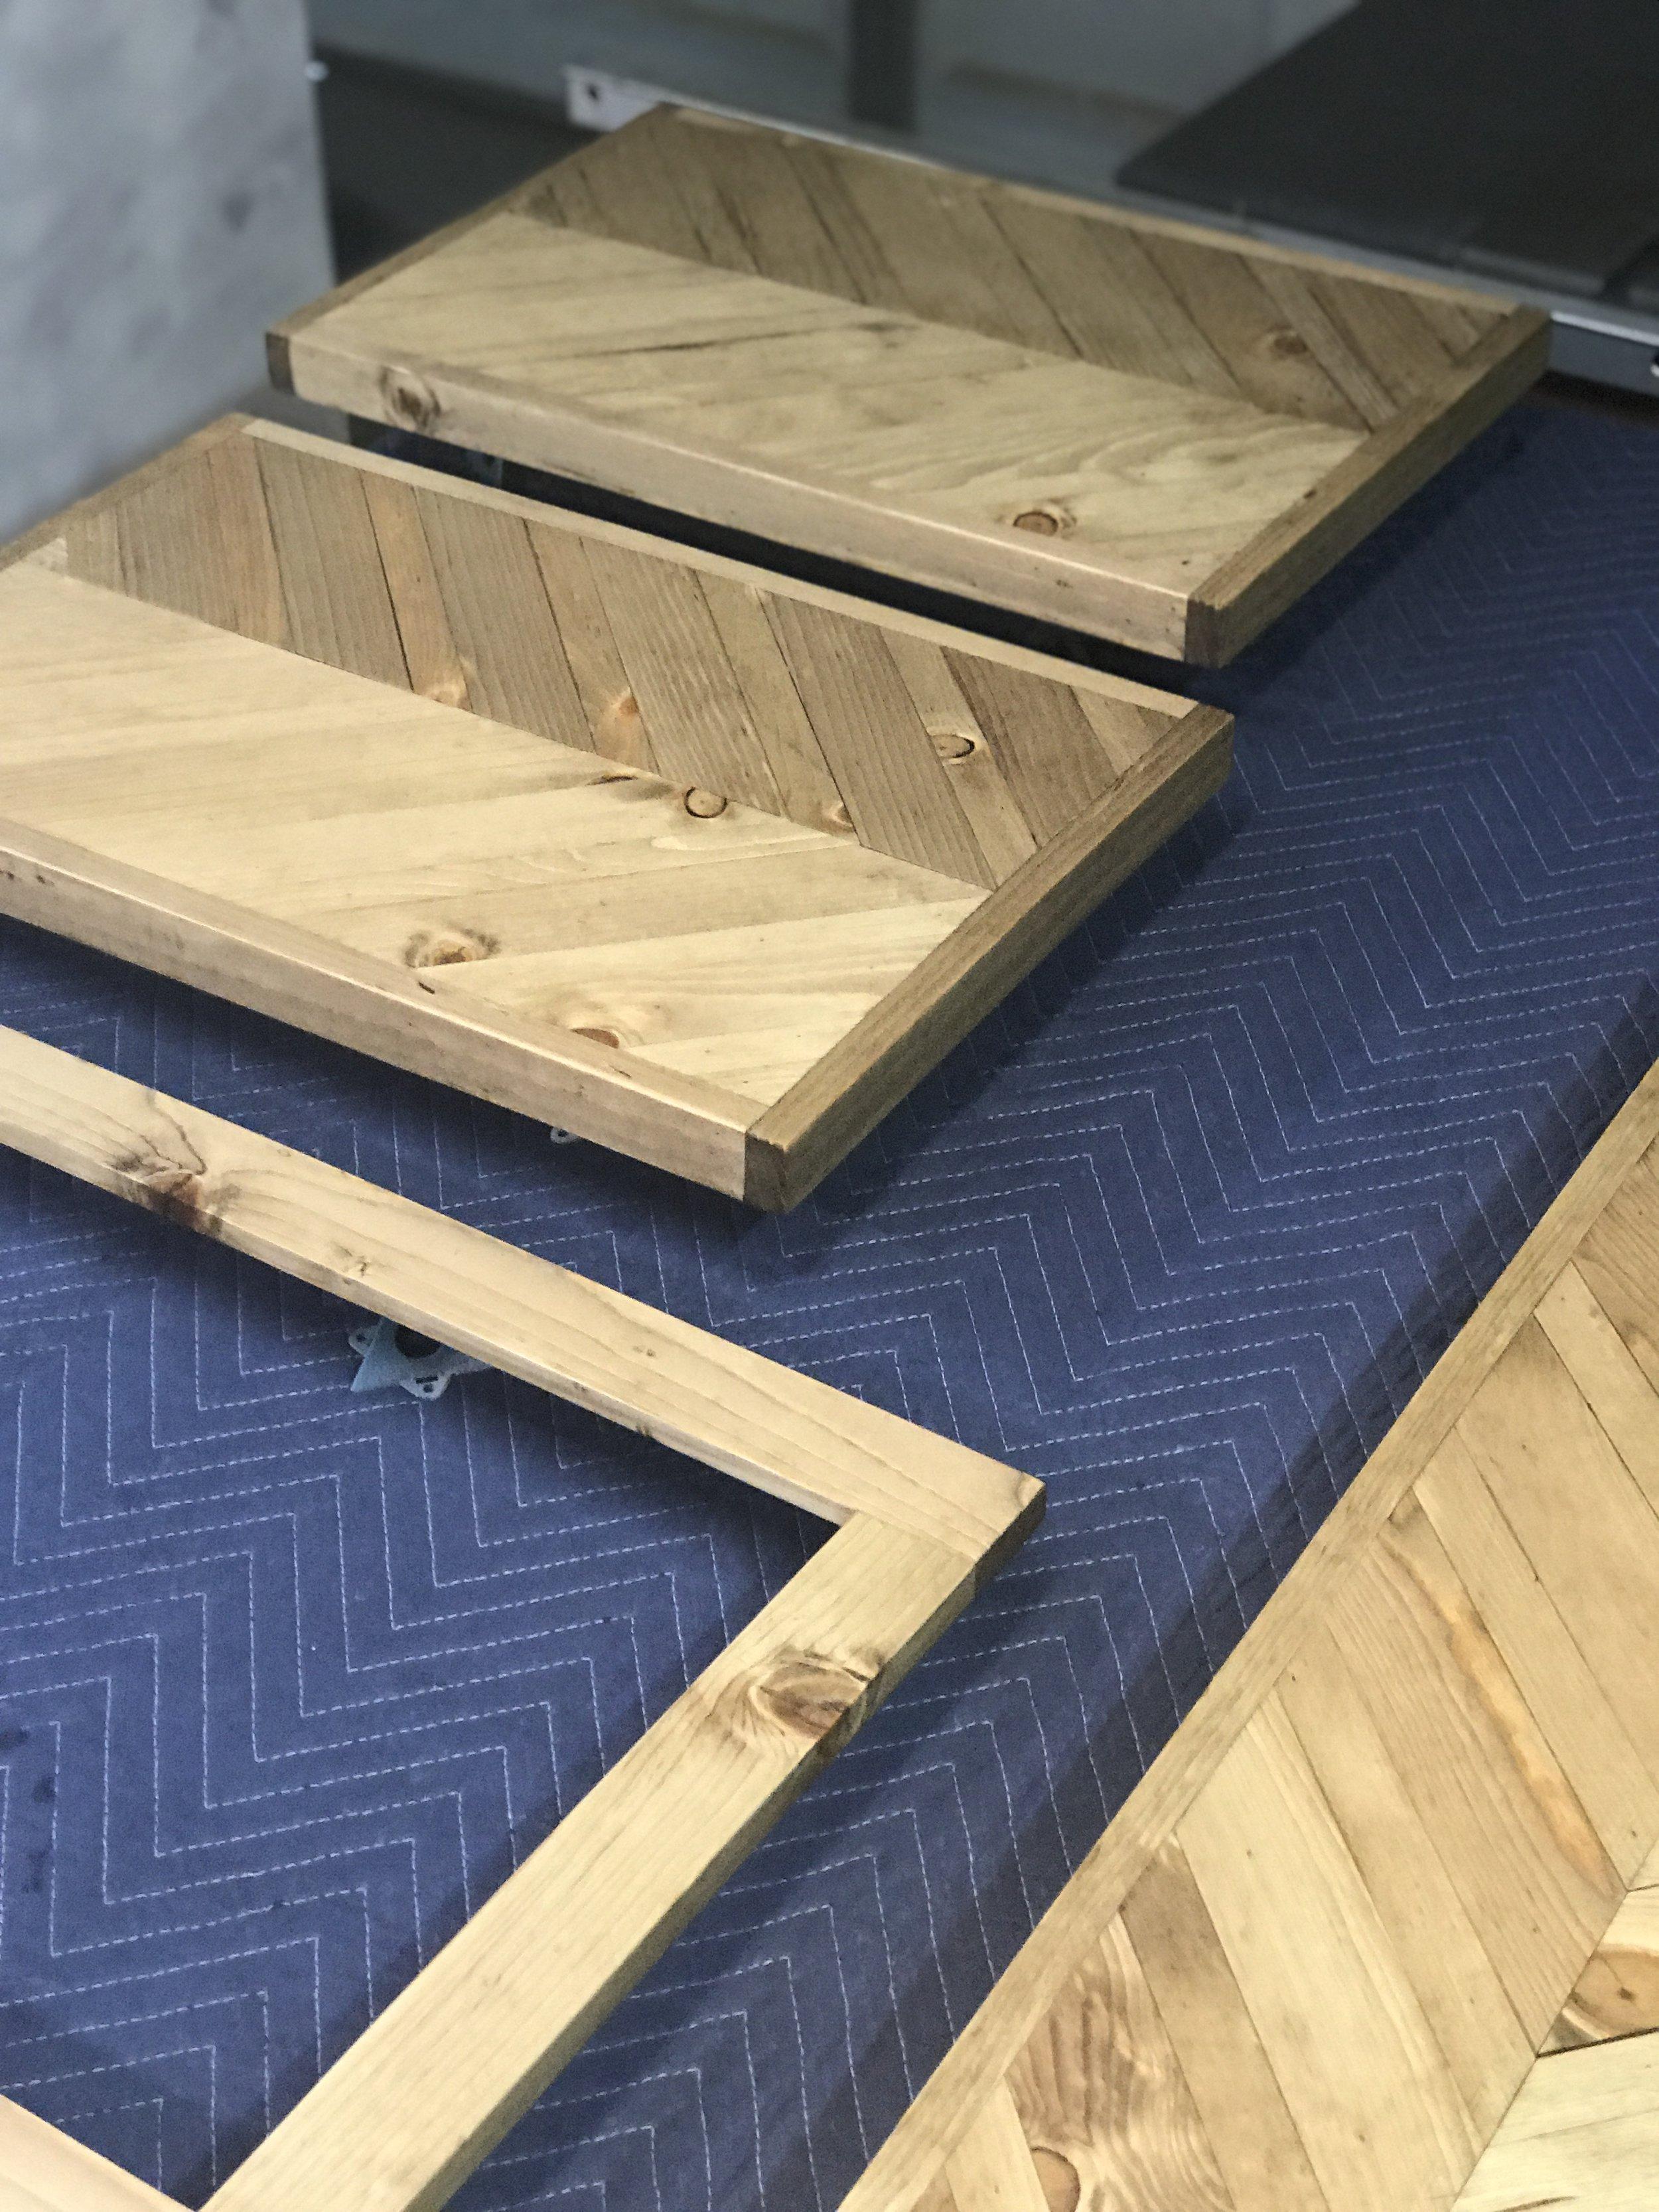 Wooden Chevron Countertops